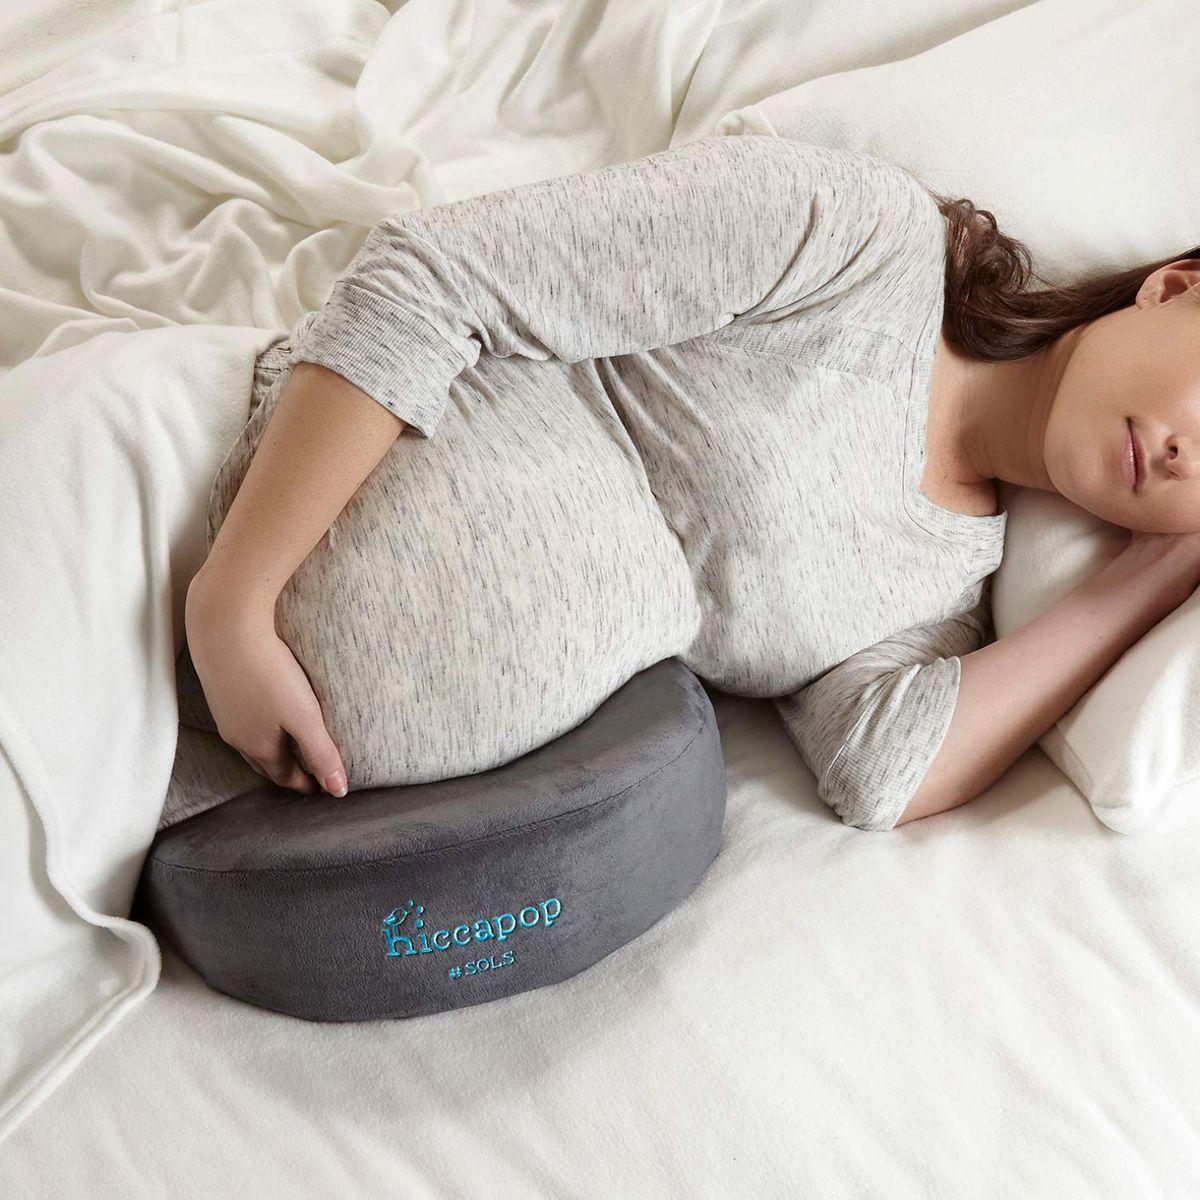 Maternity Support Bolster Long Body Pillow Pregnancy Nursing Orthopedic Cushion